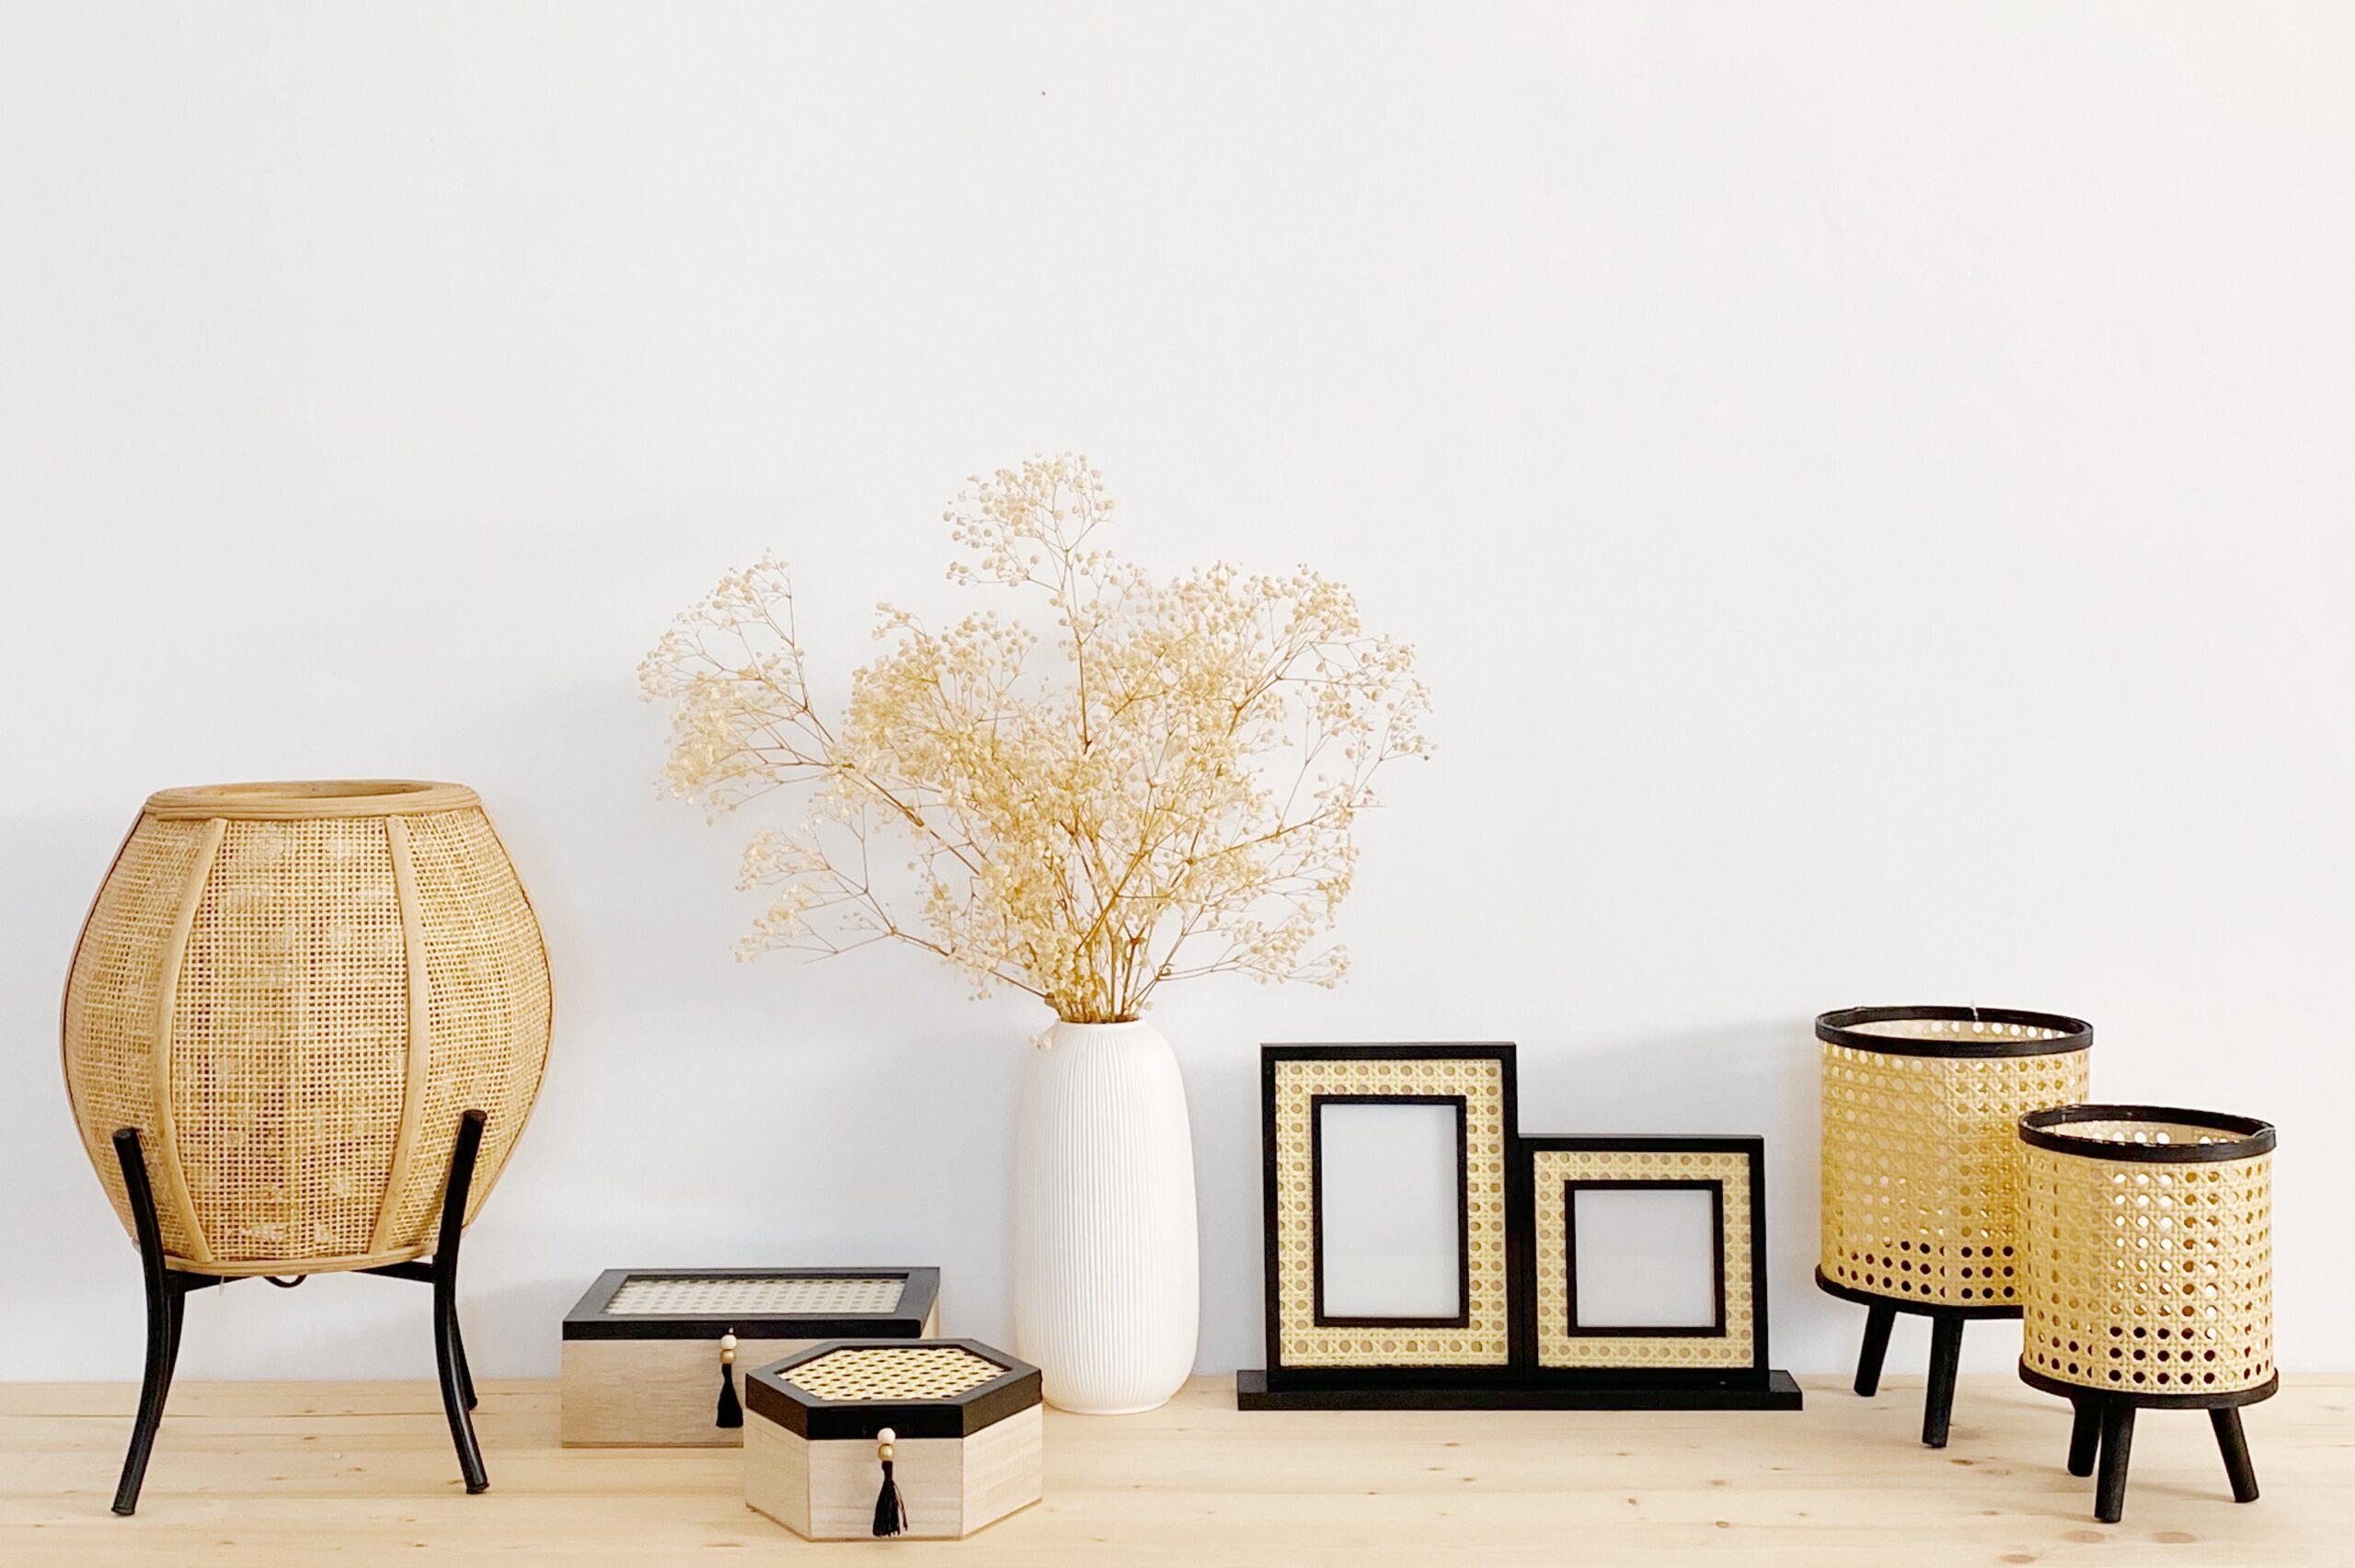 Tendencias en decoración de interiores. Cannage. Black collection